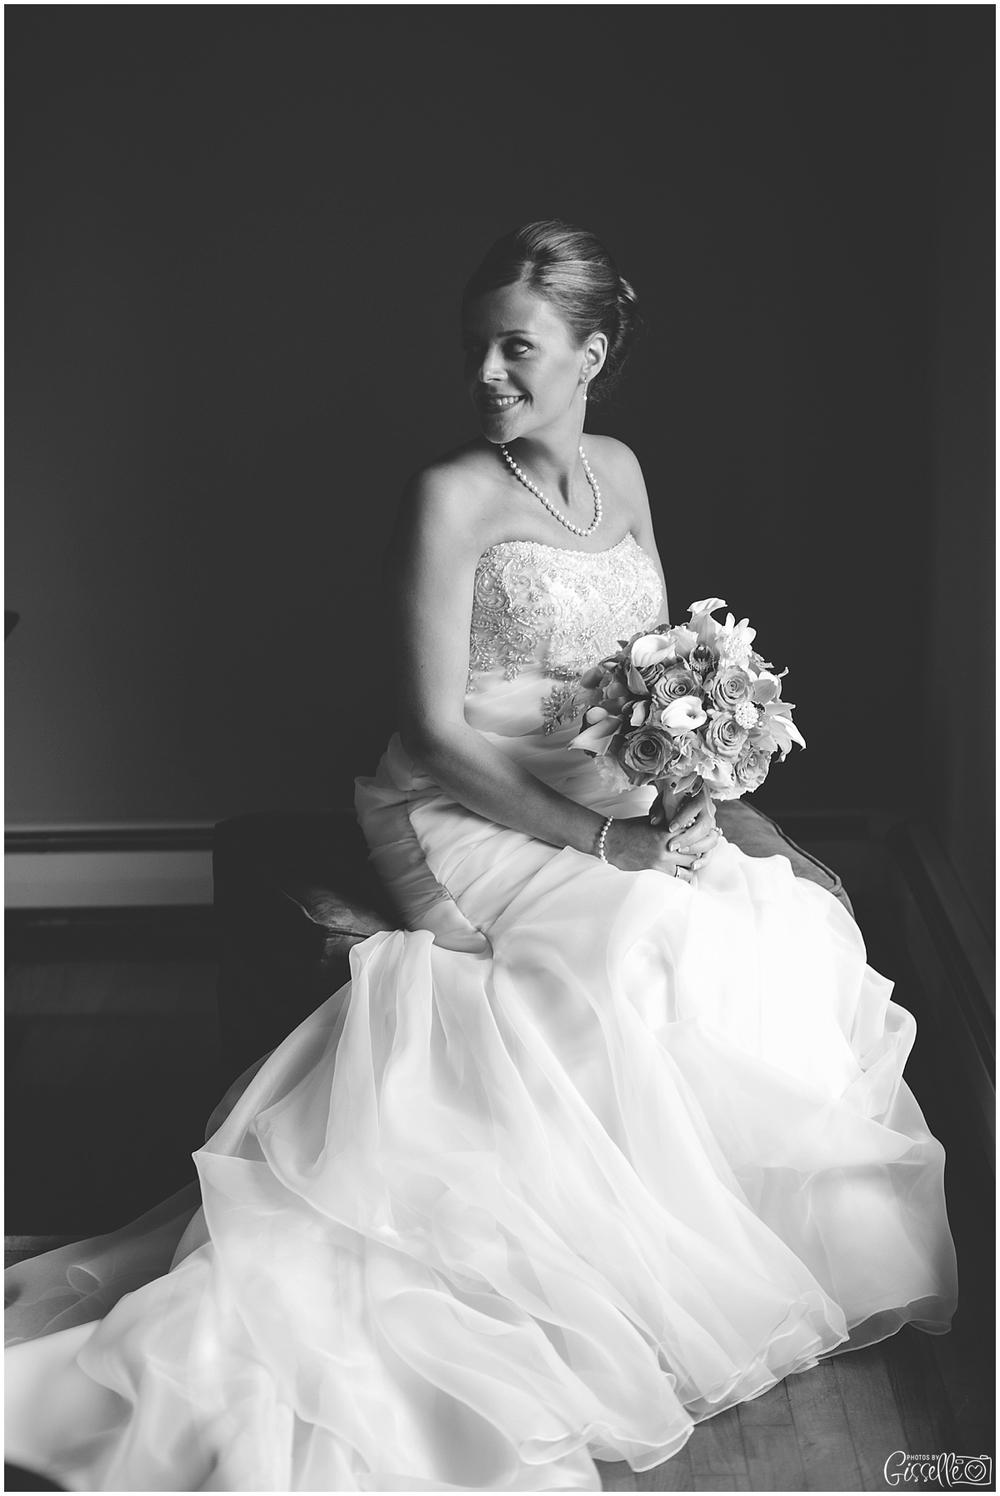 Venutis_Banquets_Addison_Wedding003.jpg